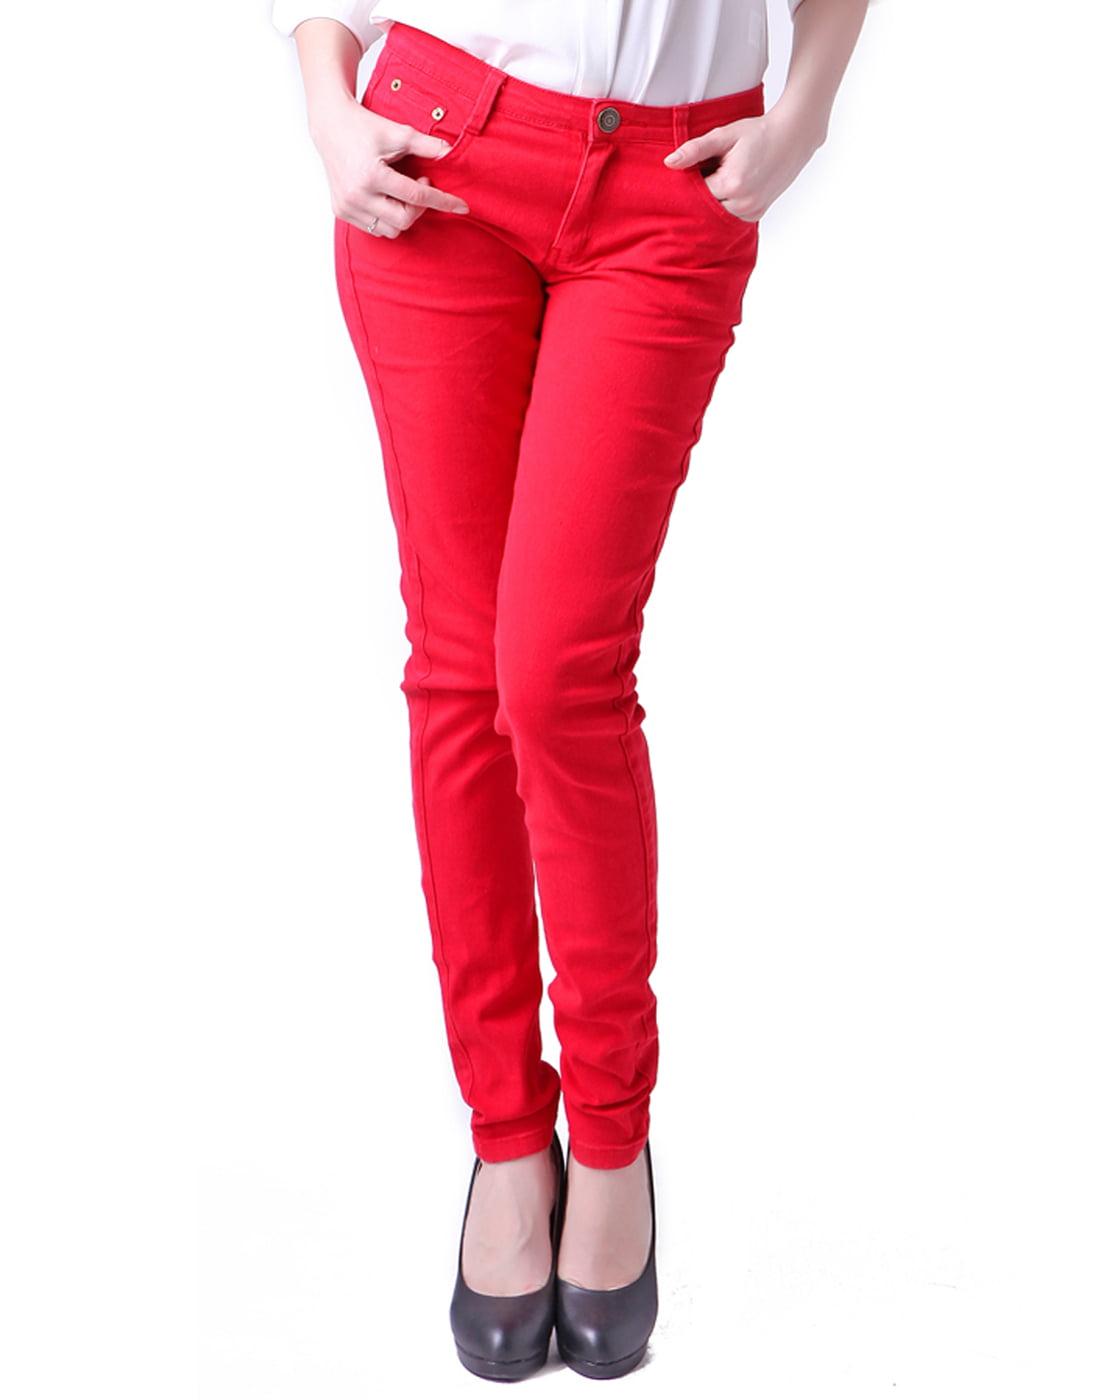 HDE Women's Jeans Jeggings Five Pocket Stretch Denim Pants (Red, X-Large)